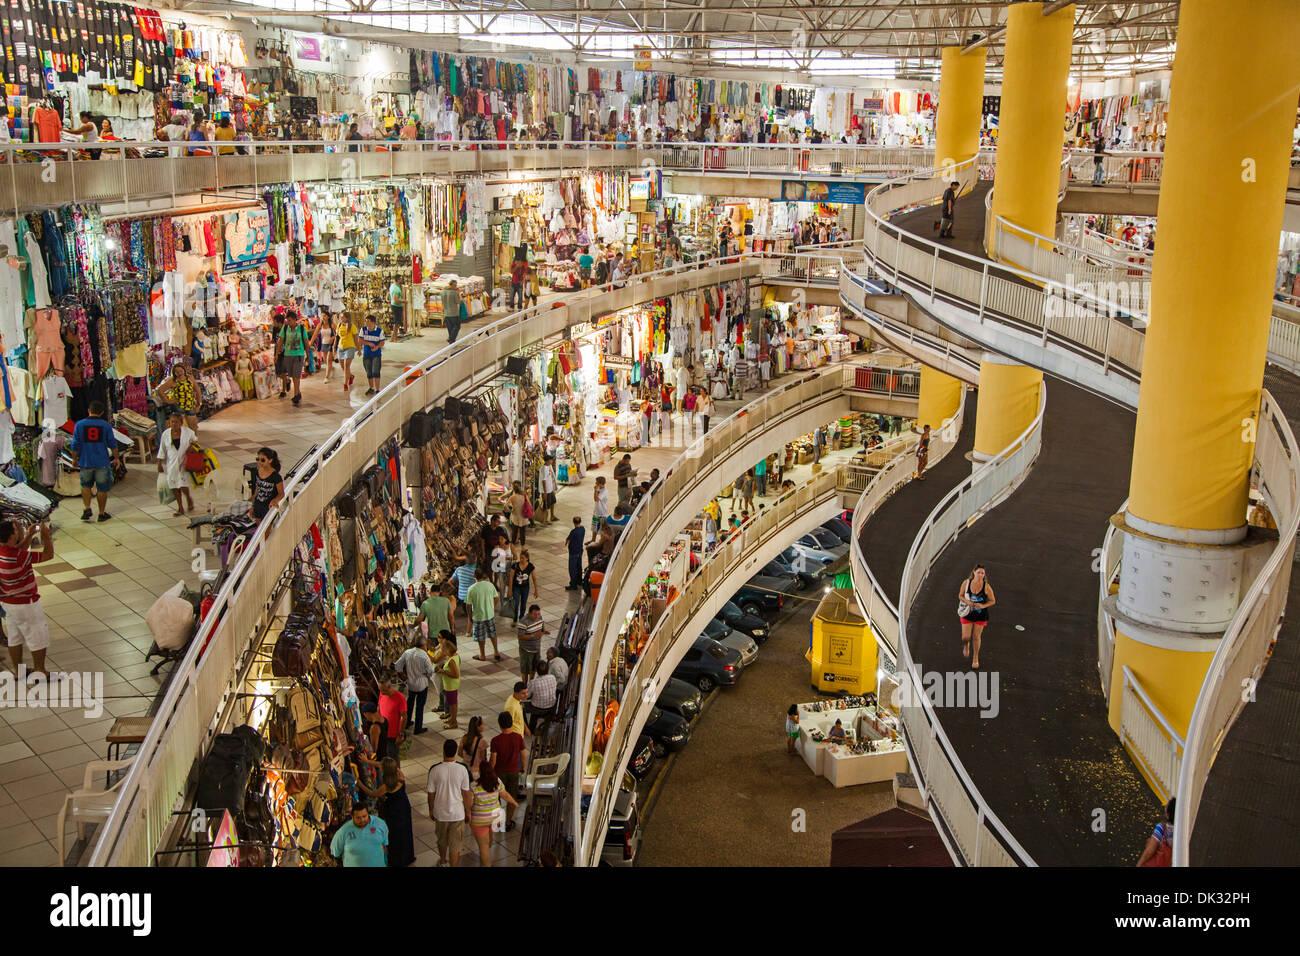 Mercado Central, Fortaleza, Brazil. - Stock Image